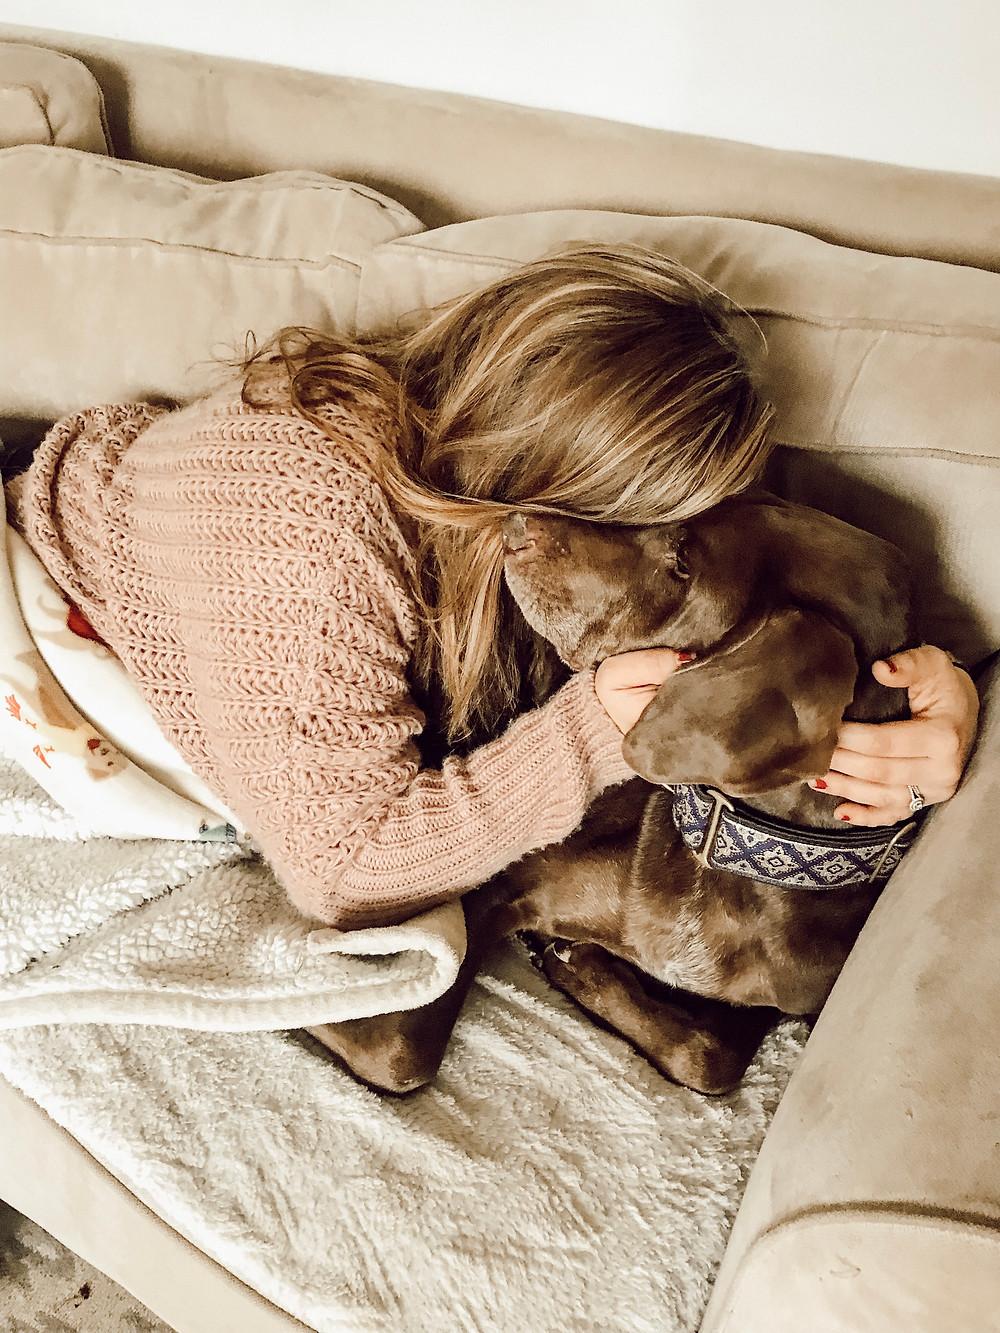 Grieving a pet loss